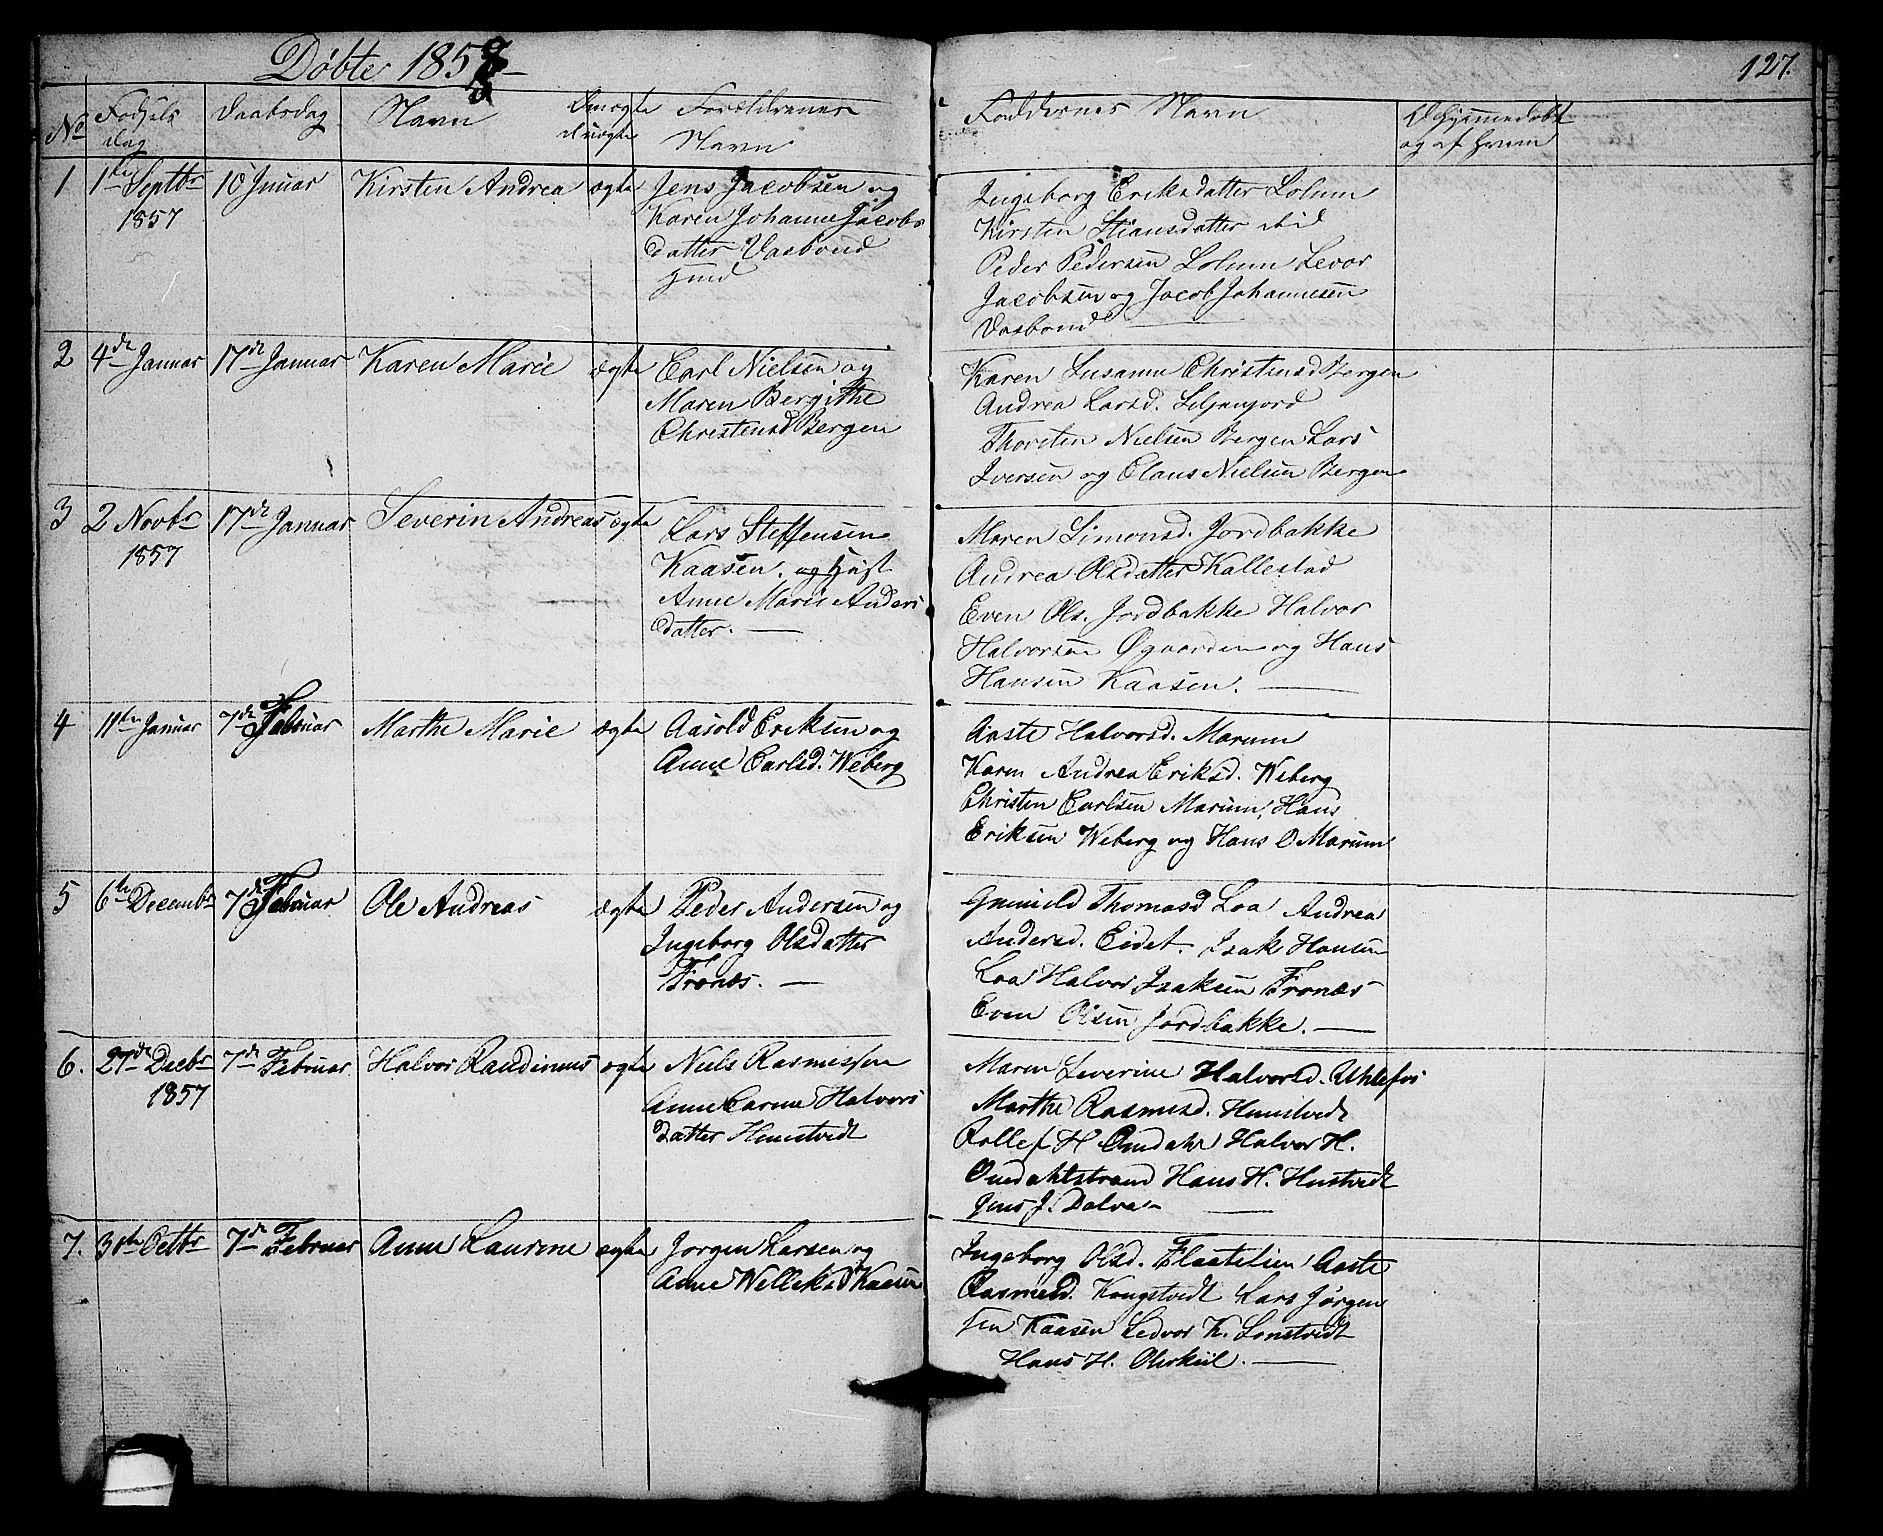 SAKO, Solum kirkebøker, G/Gb/L0001: Klokkerbok nr. II 1, 1848-1859, s. 127